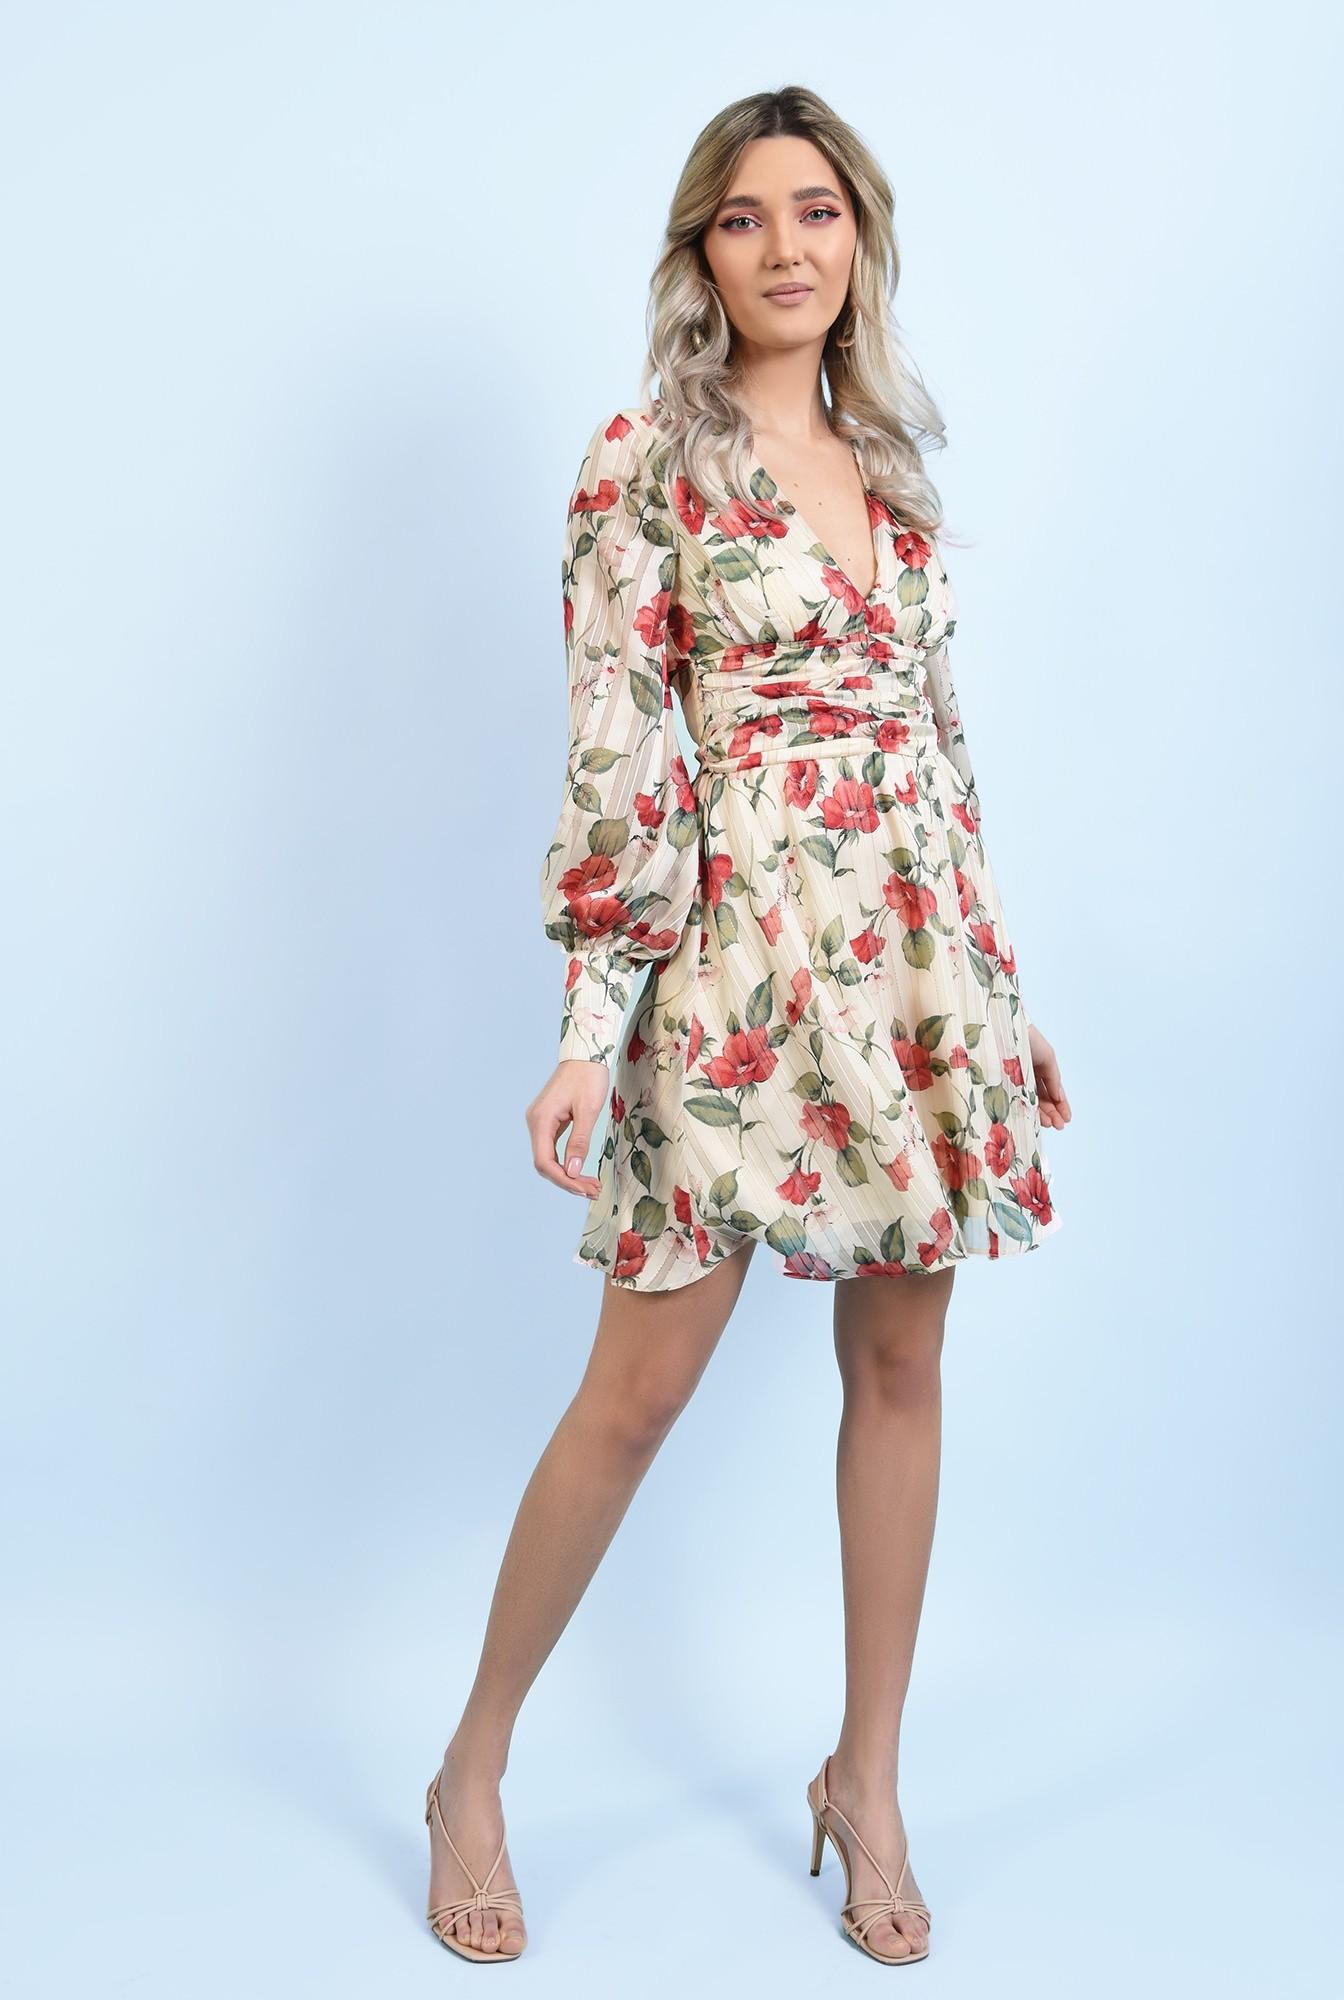 3 - rochie mini, din sifon, cu flori, maneci lungi, betelie fronsata